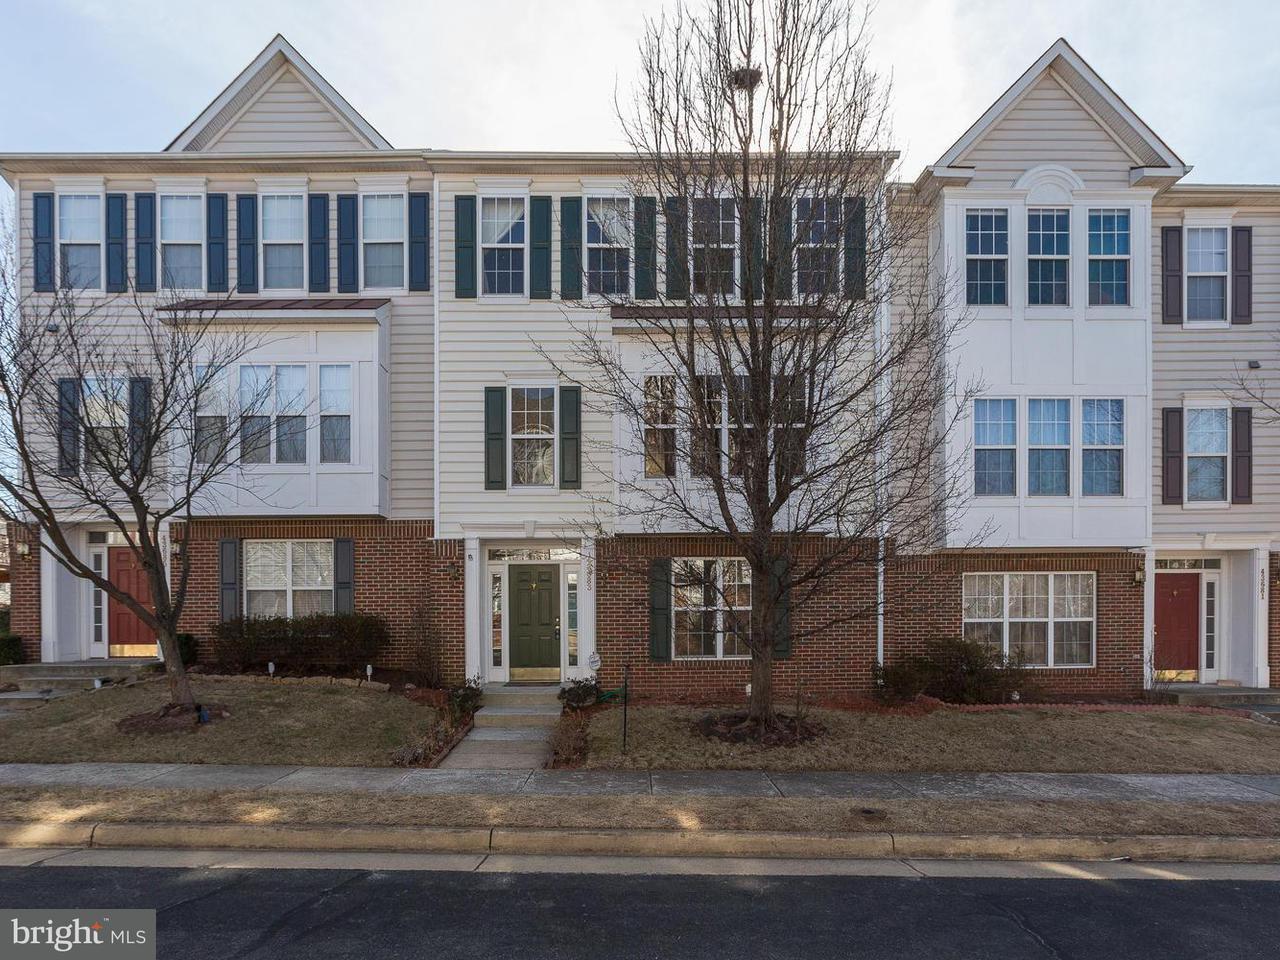 Townhouse for Sale at 43683 Balmoral Ter 43683 Balmoral Ter Ashburn, Virginia 20147 United States